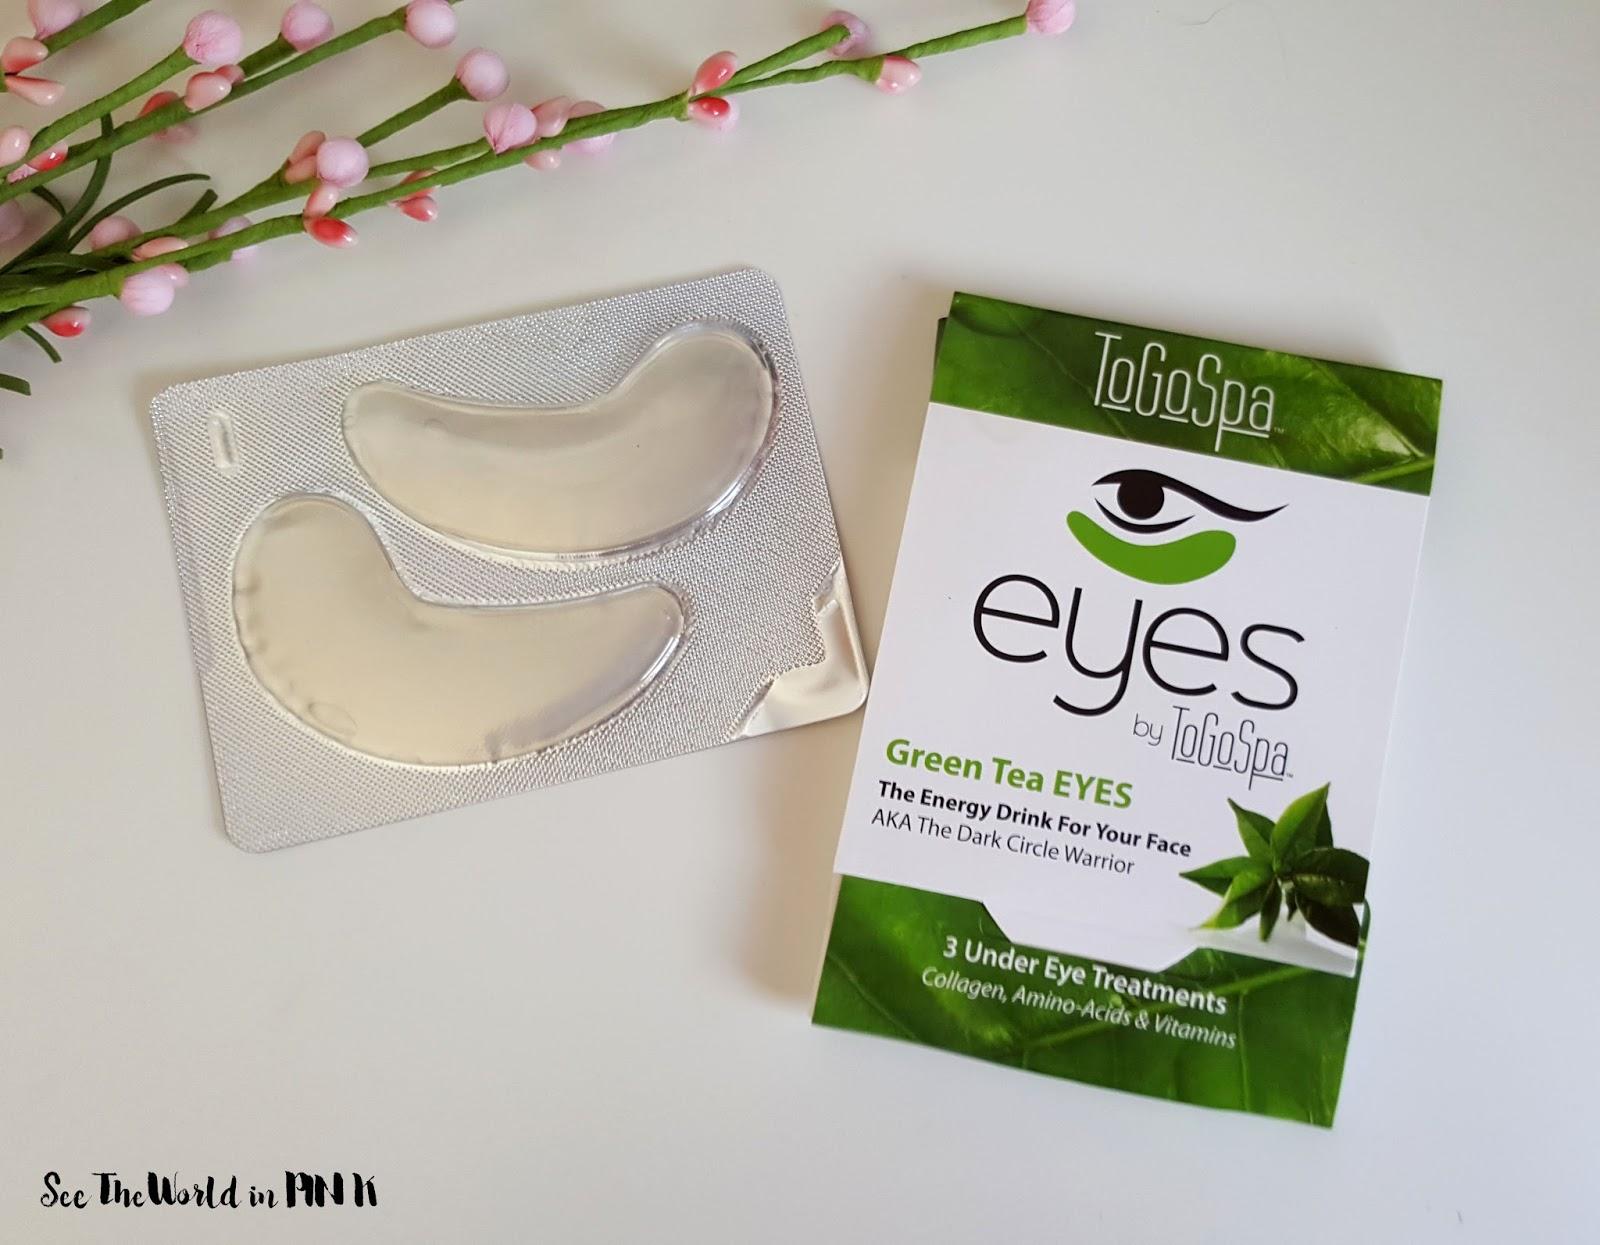 Mask Wednesday - ToGoSpa Green Tea Eyes Review